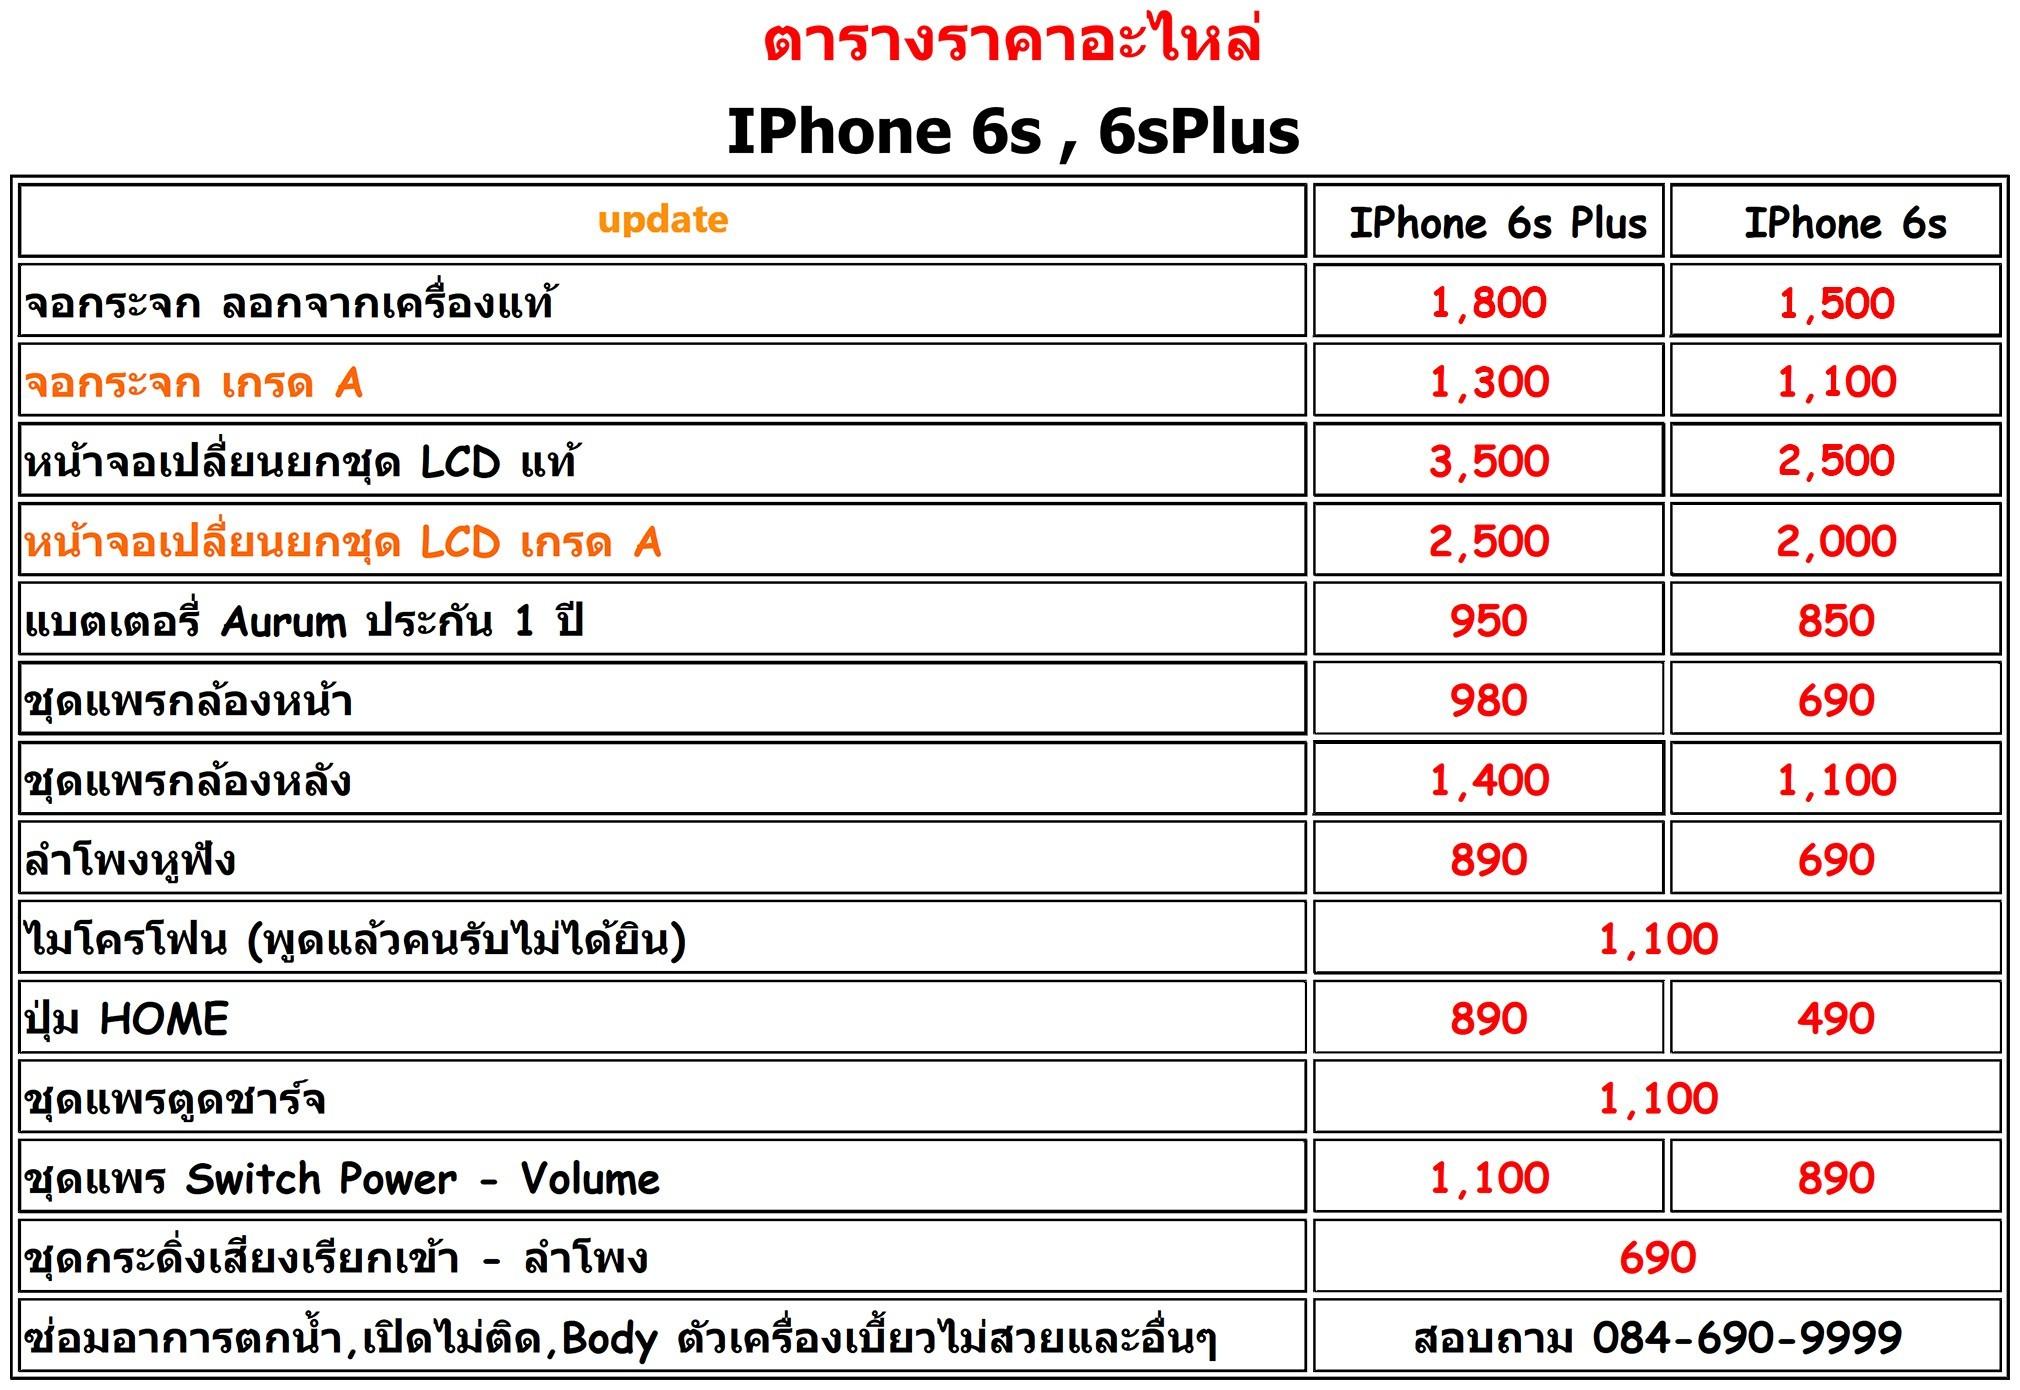 Perfectphonembk.com ซ่อมไอโฟน6s ซ่อมไอโฟน6splus เปลี่ยนจอไอโฟน6s เปลี่ยนจอไอโฟน6splus ซ่อมมือถือ ซ่อมจอมือถือ เปลี่ยนจอ ร้านขายมือถือราคาถูก ซ่อมไอโฟน ราคาซ่อมมือถือ เปลี่ยนจอไอโฟน